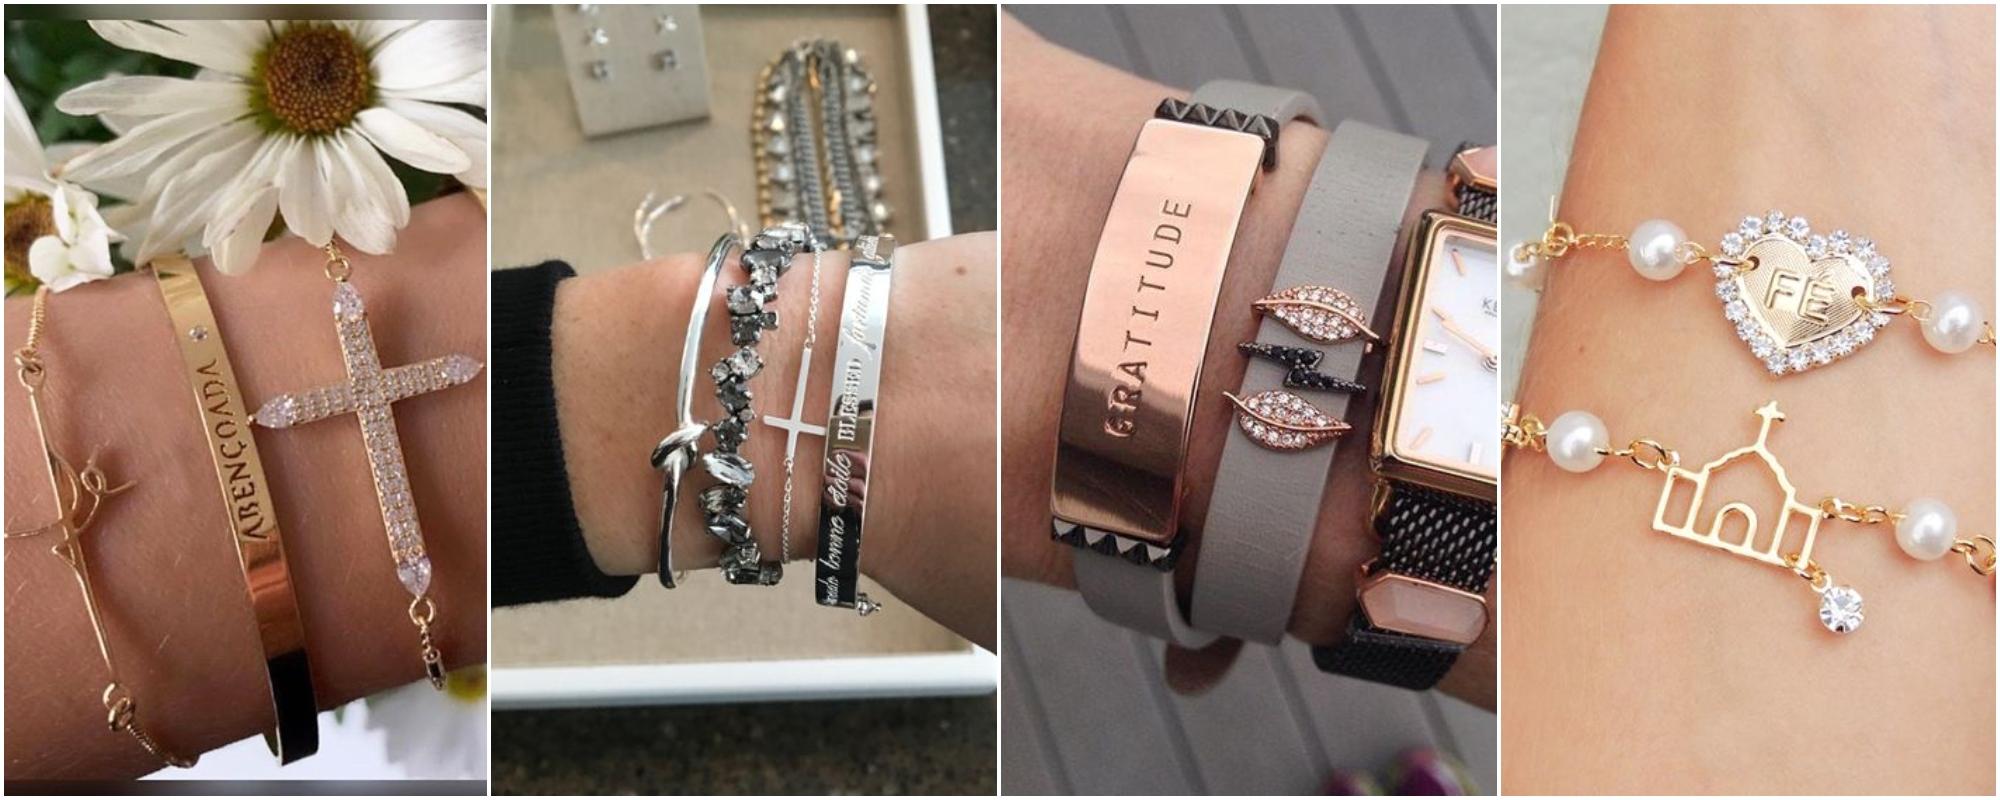 Como usar pulseiras religiosas no dia a dia